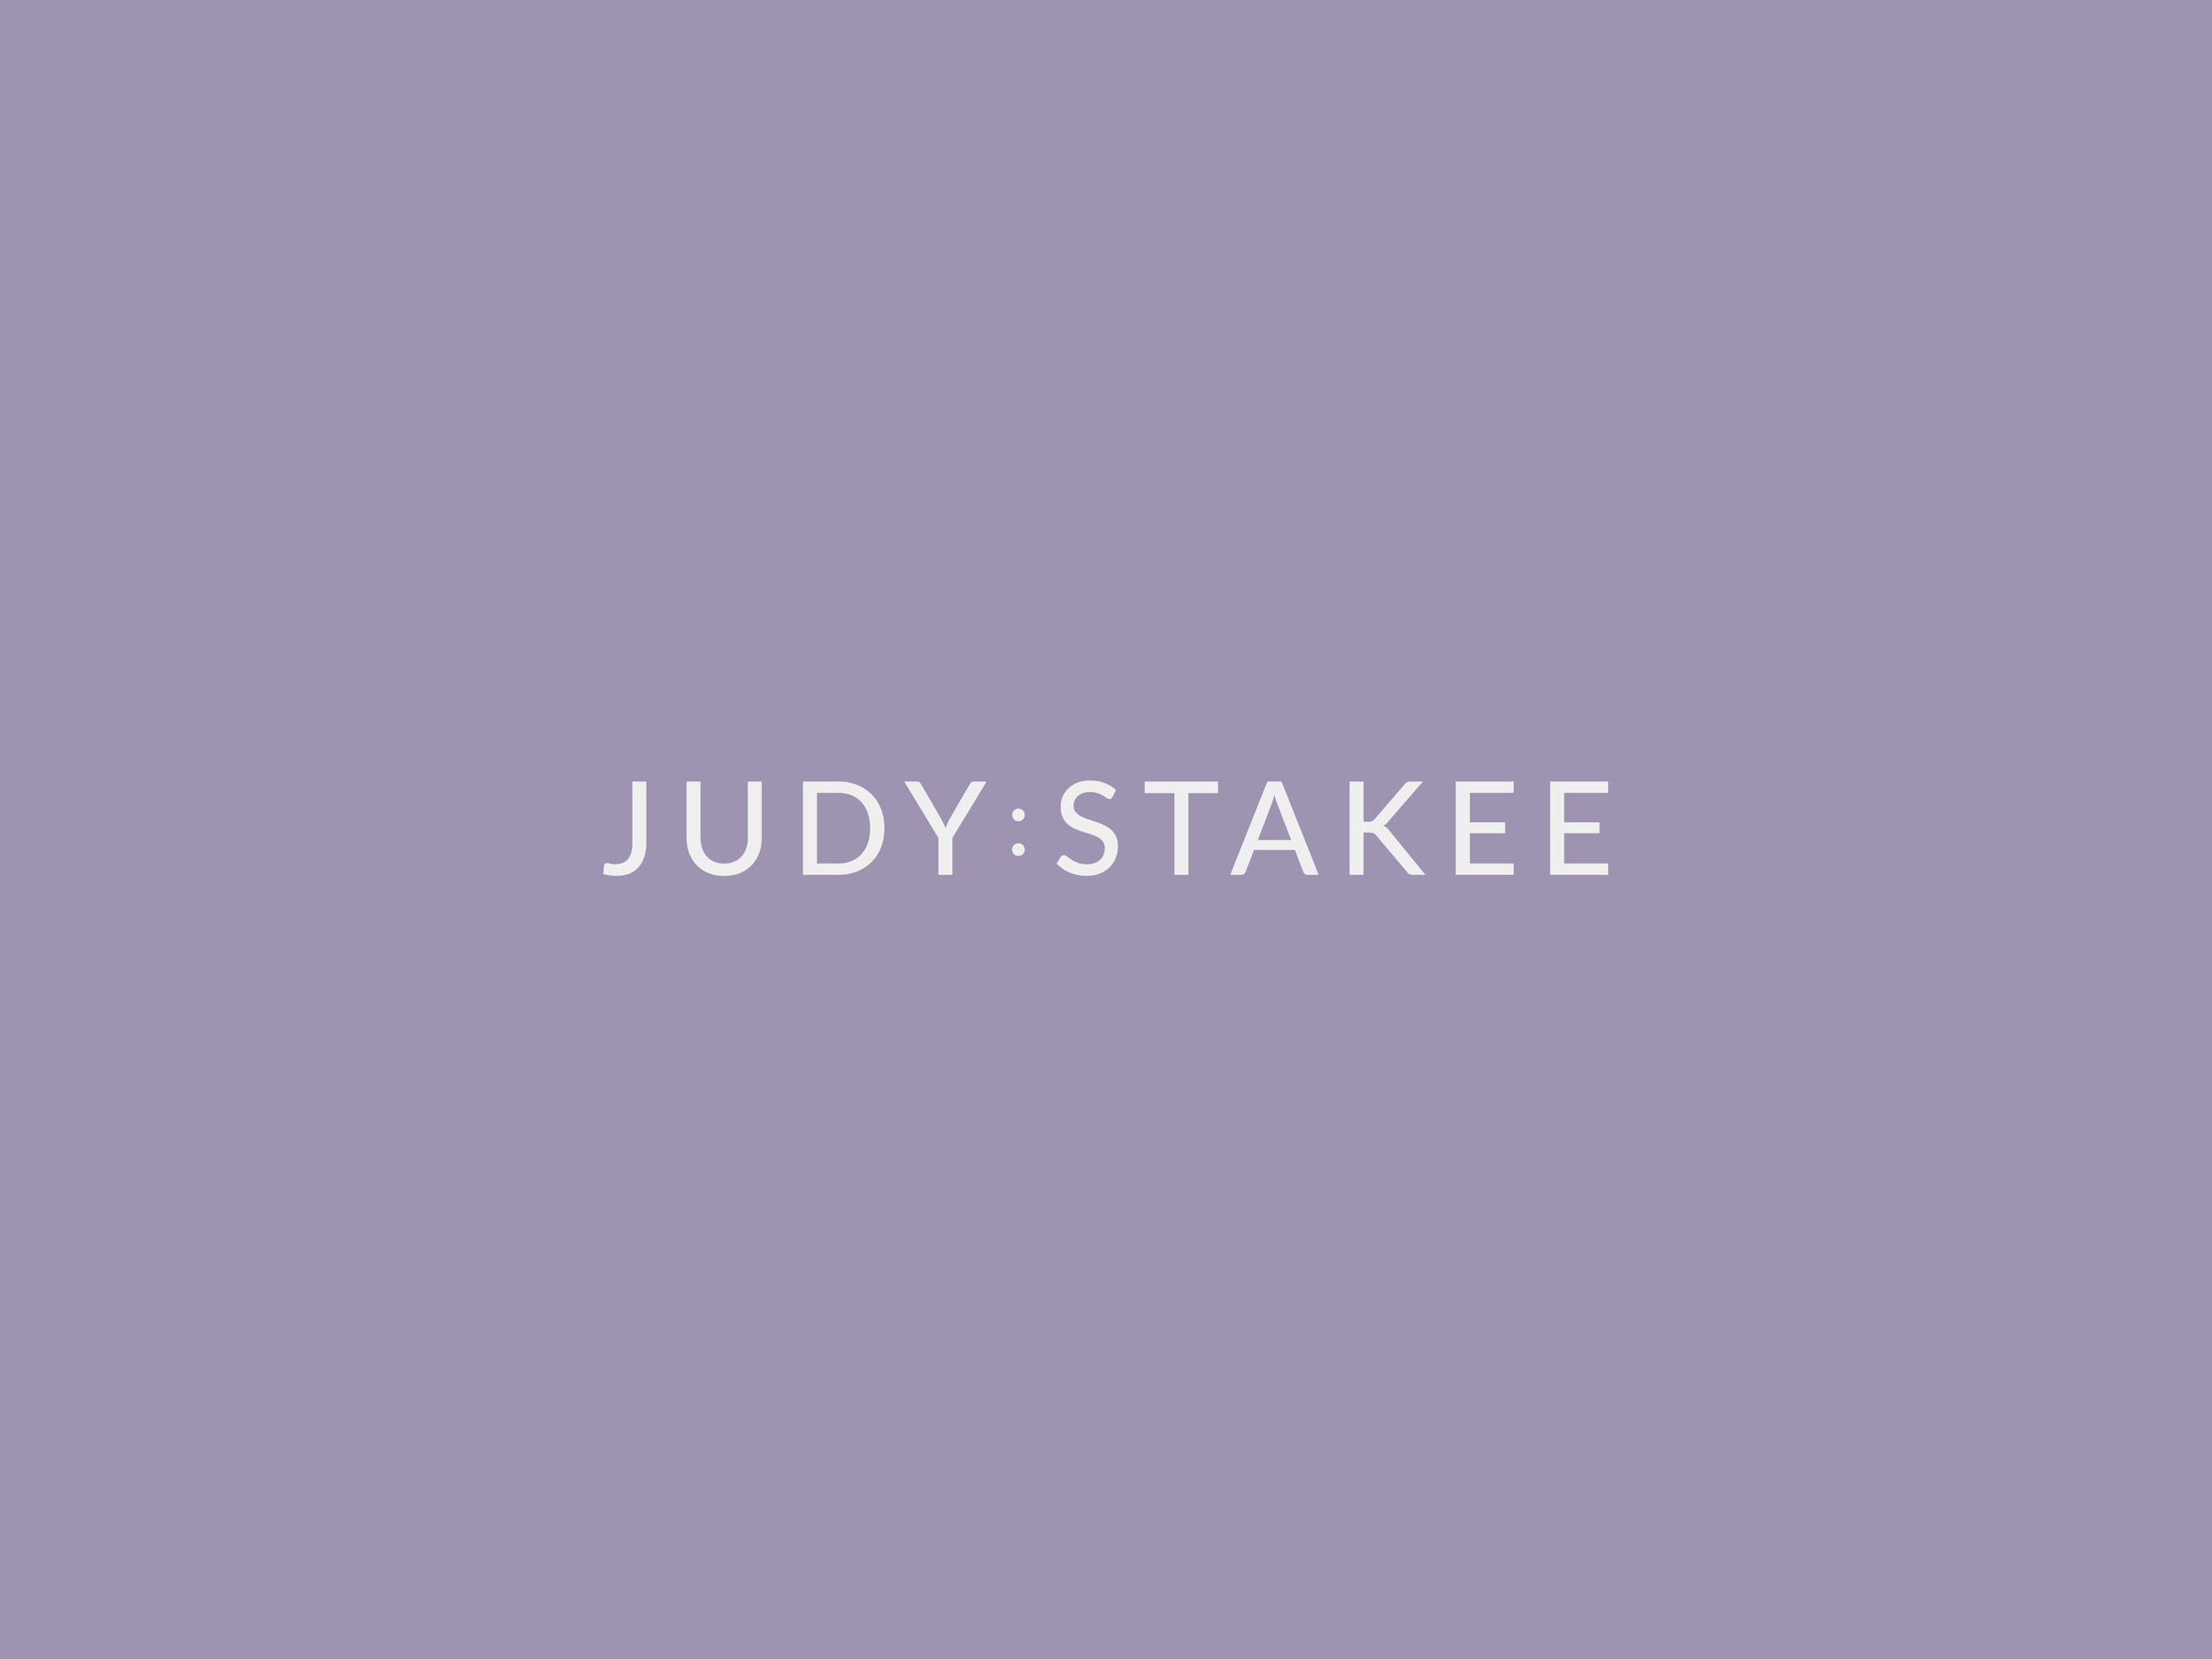 judy-stakee-brand-identity-03.jpg